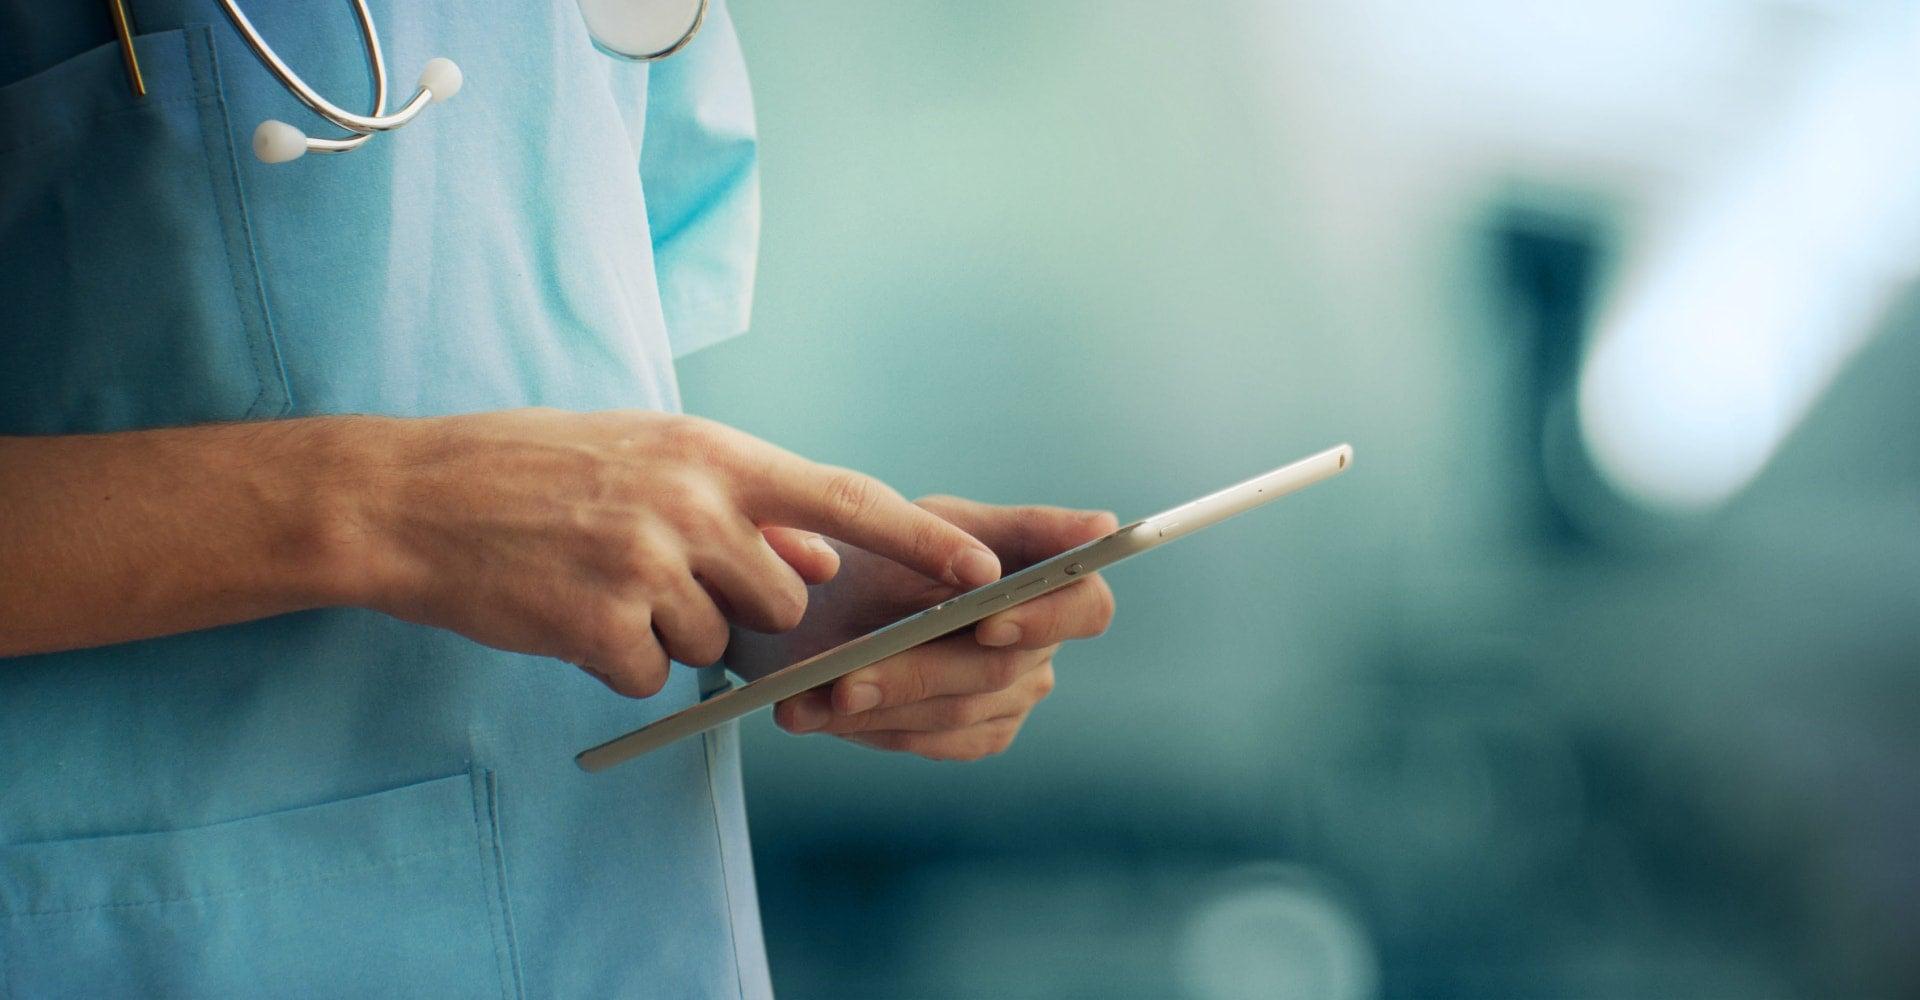 Reducing Costs with DataRobot at Steward Health hero banner